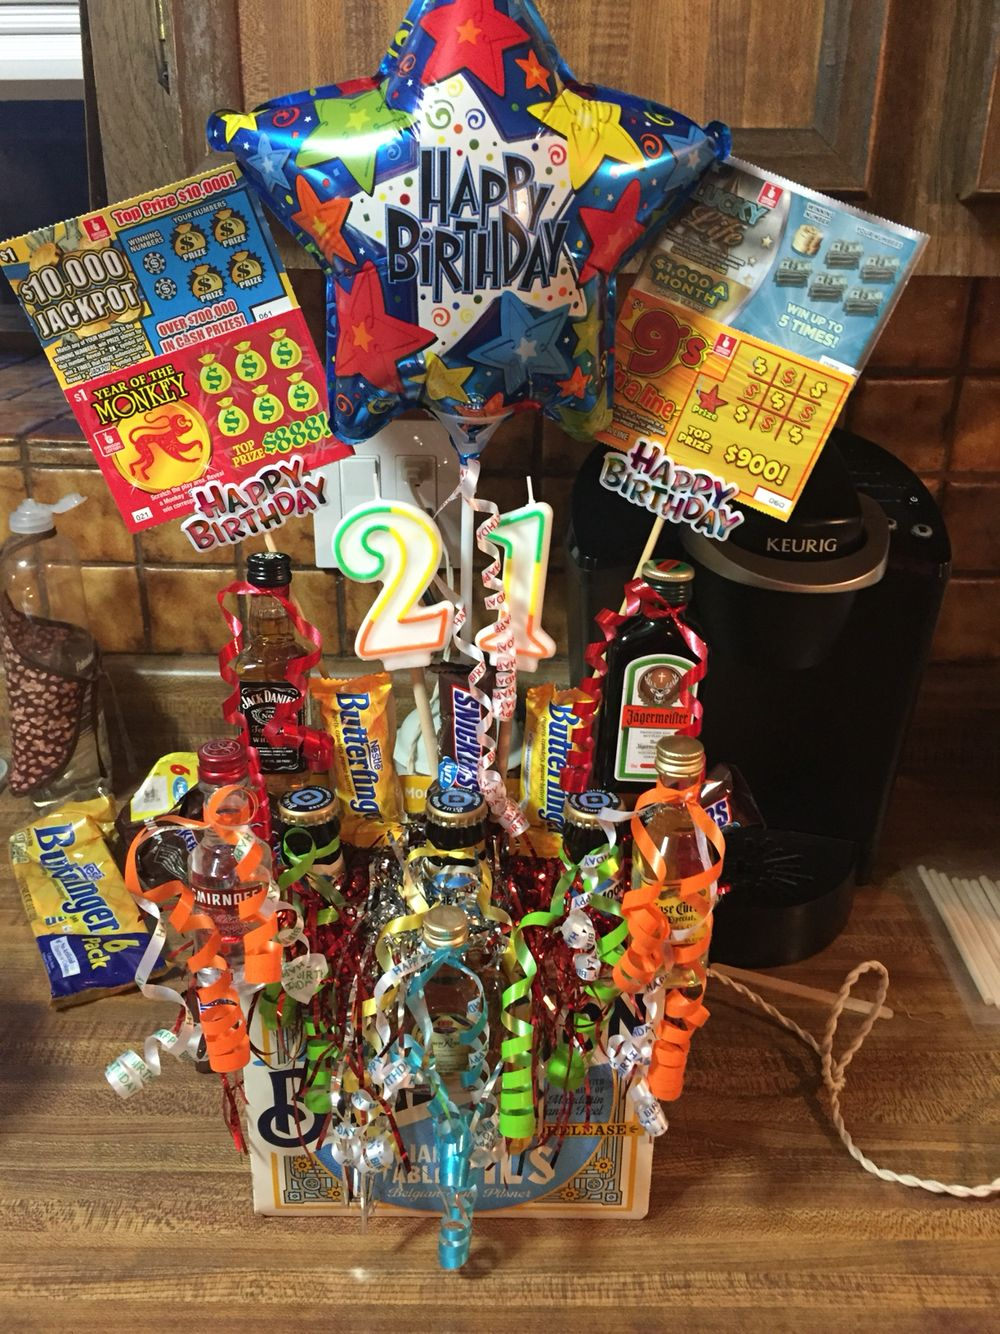 21st birthday boozequet diy gifts 21st birthday gifts